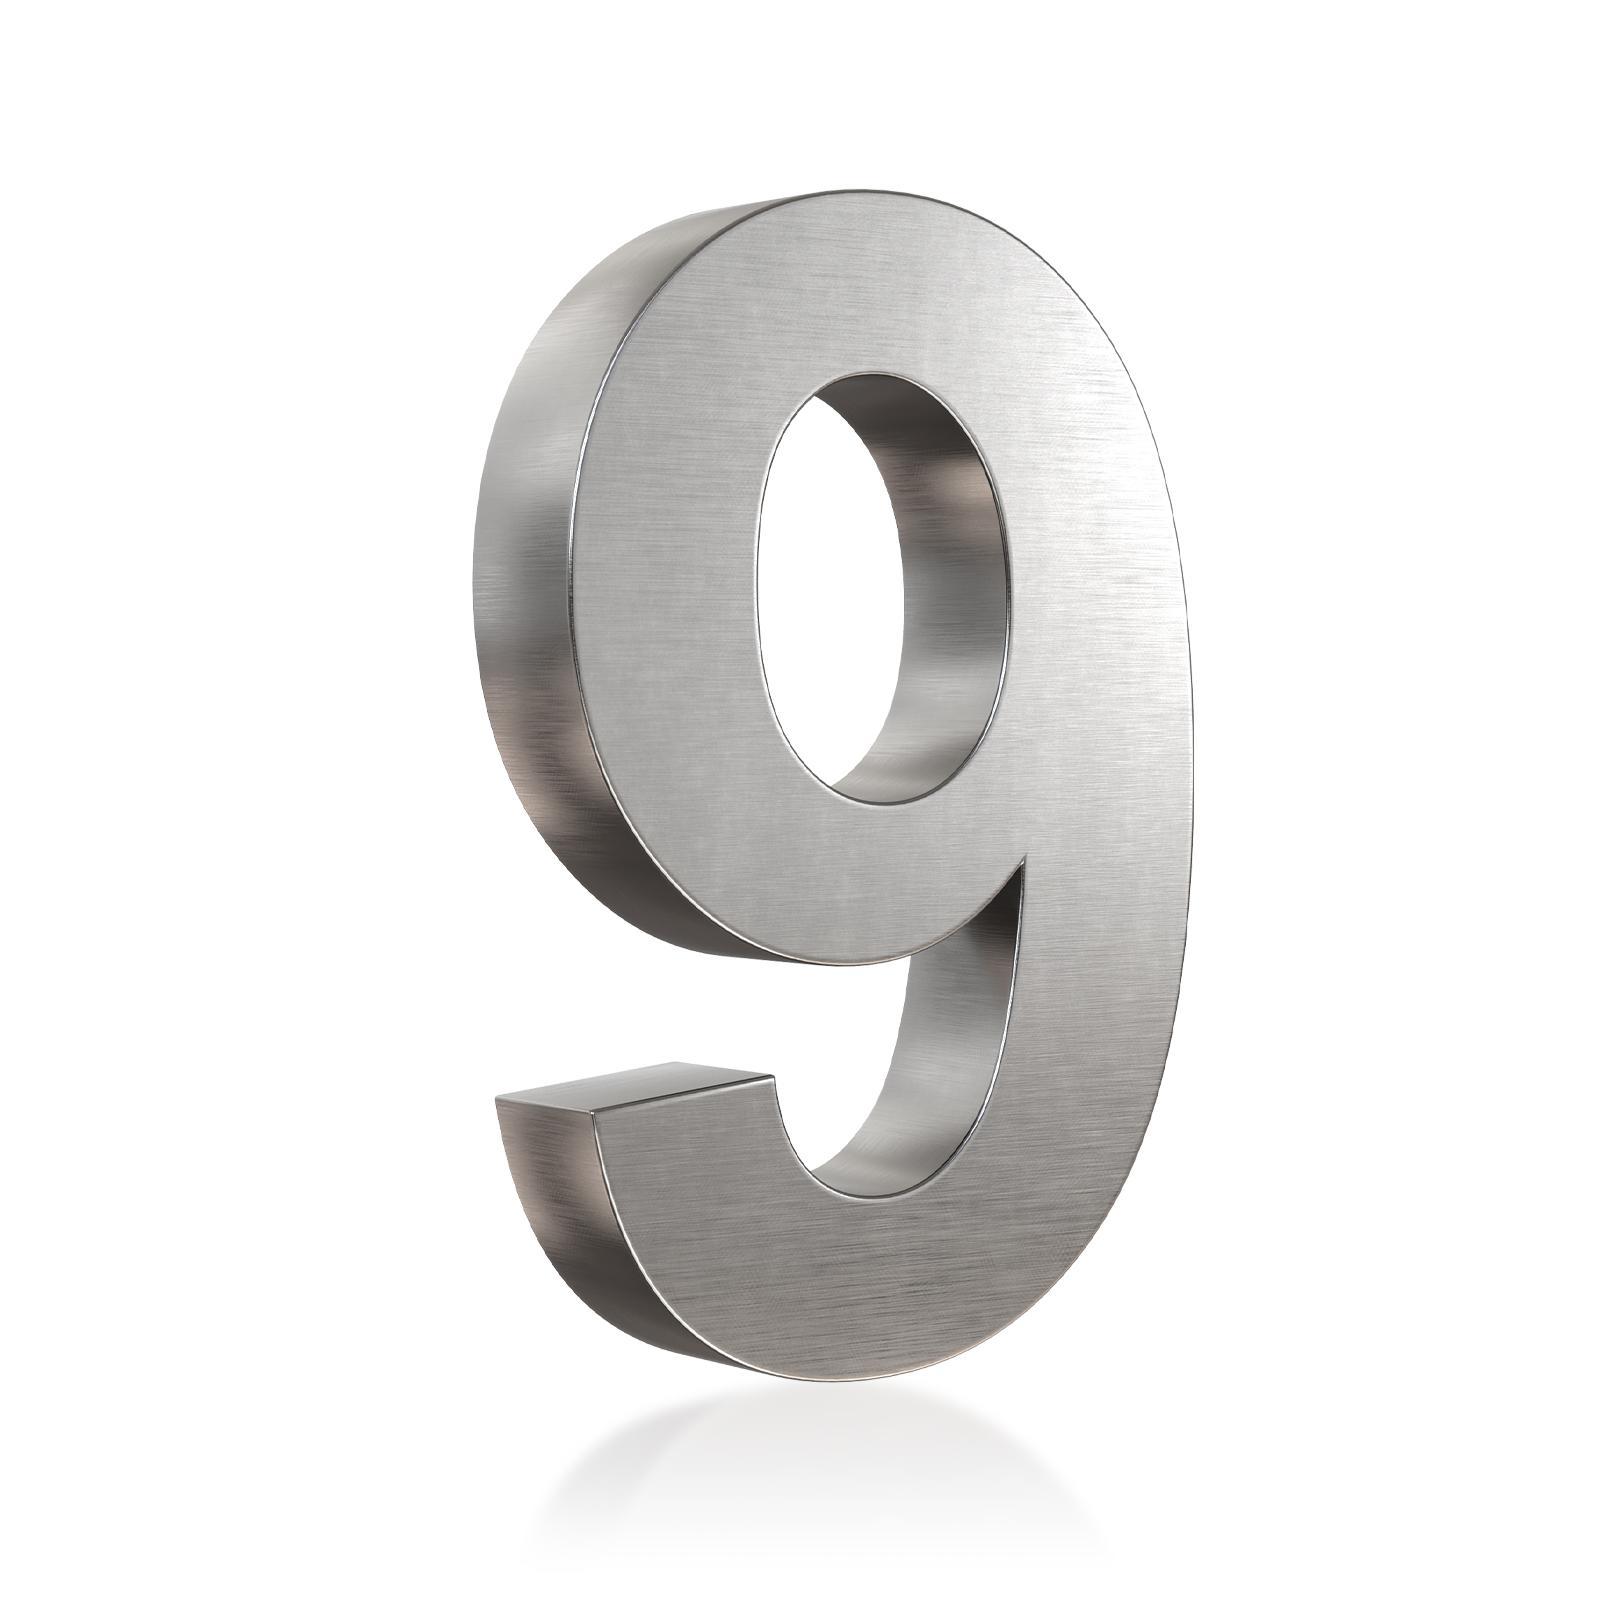 3D Hausnummer 9 Edelstahl in 3D Design Arial V2A